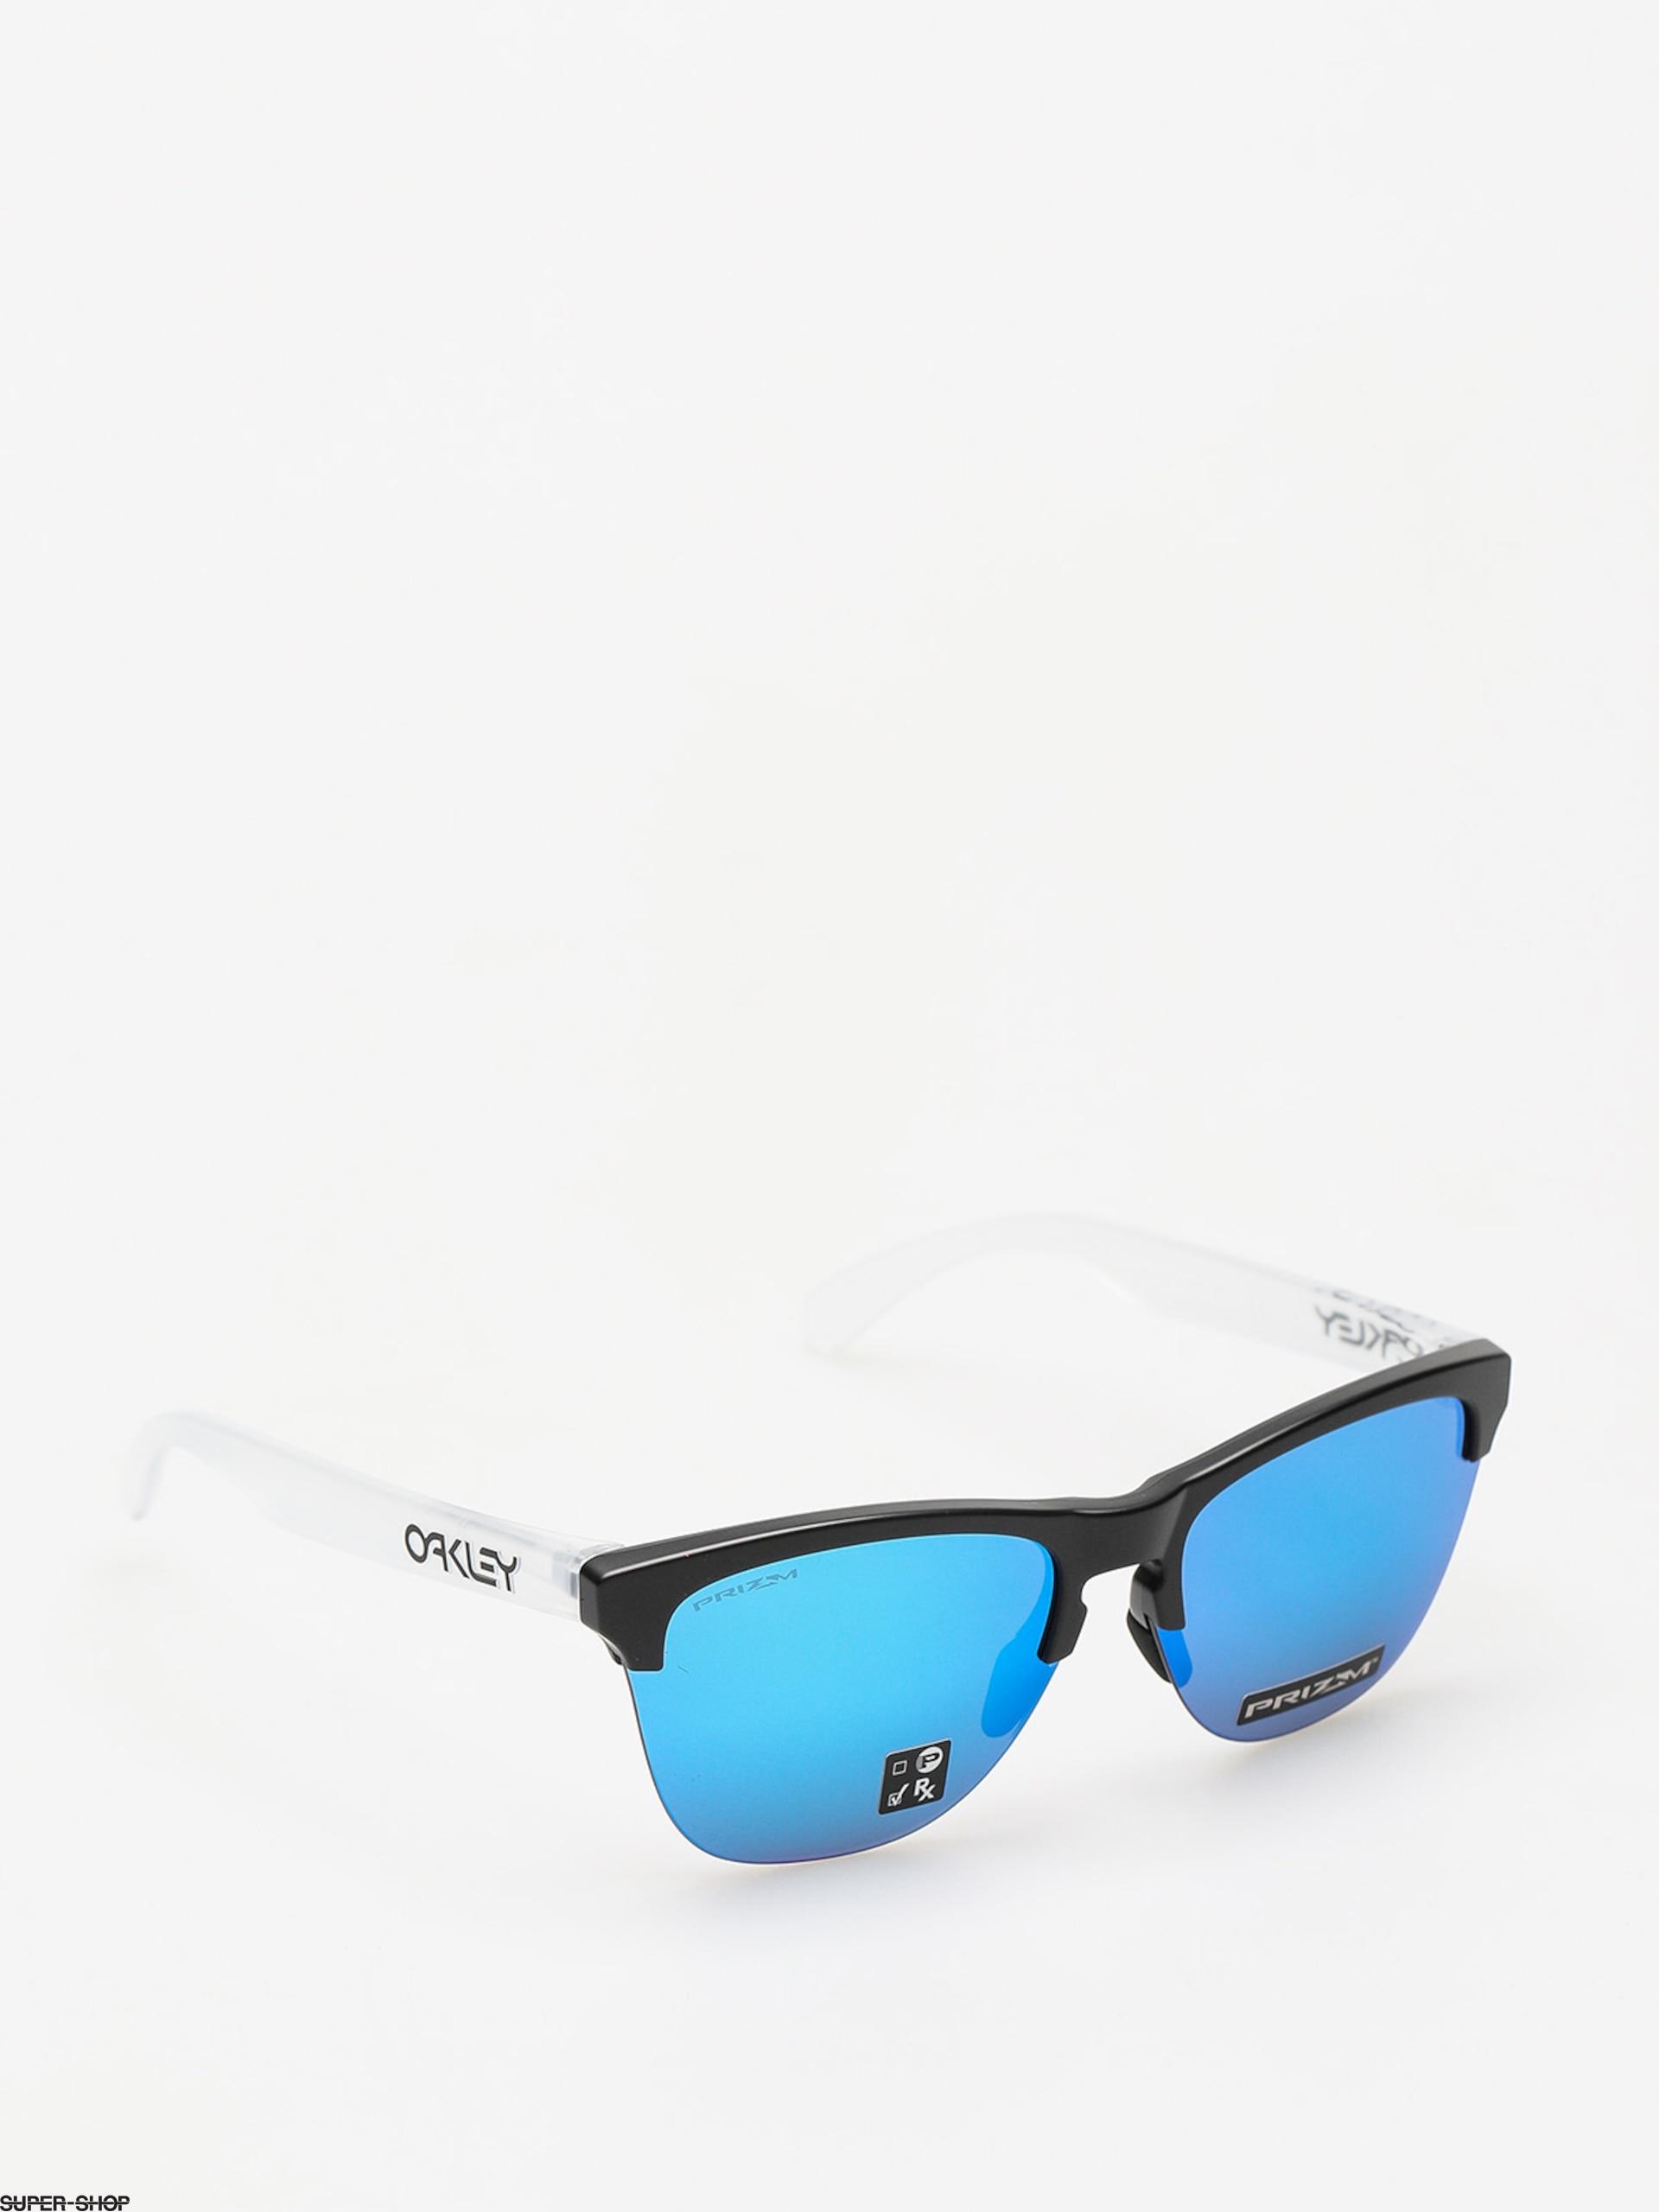 978d6b008ff 931768-w1920-oakley-sunglasses-frogskins-lite-matte-black-matte-clear-prizm- sapphire-iridium.jpg